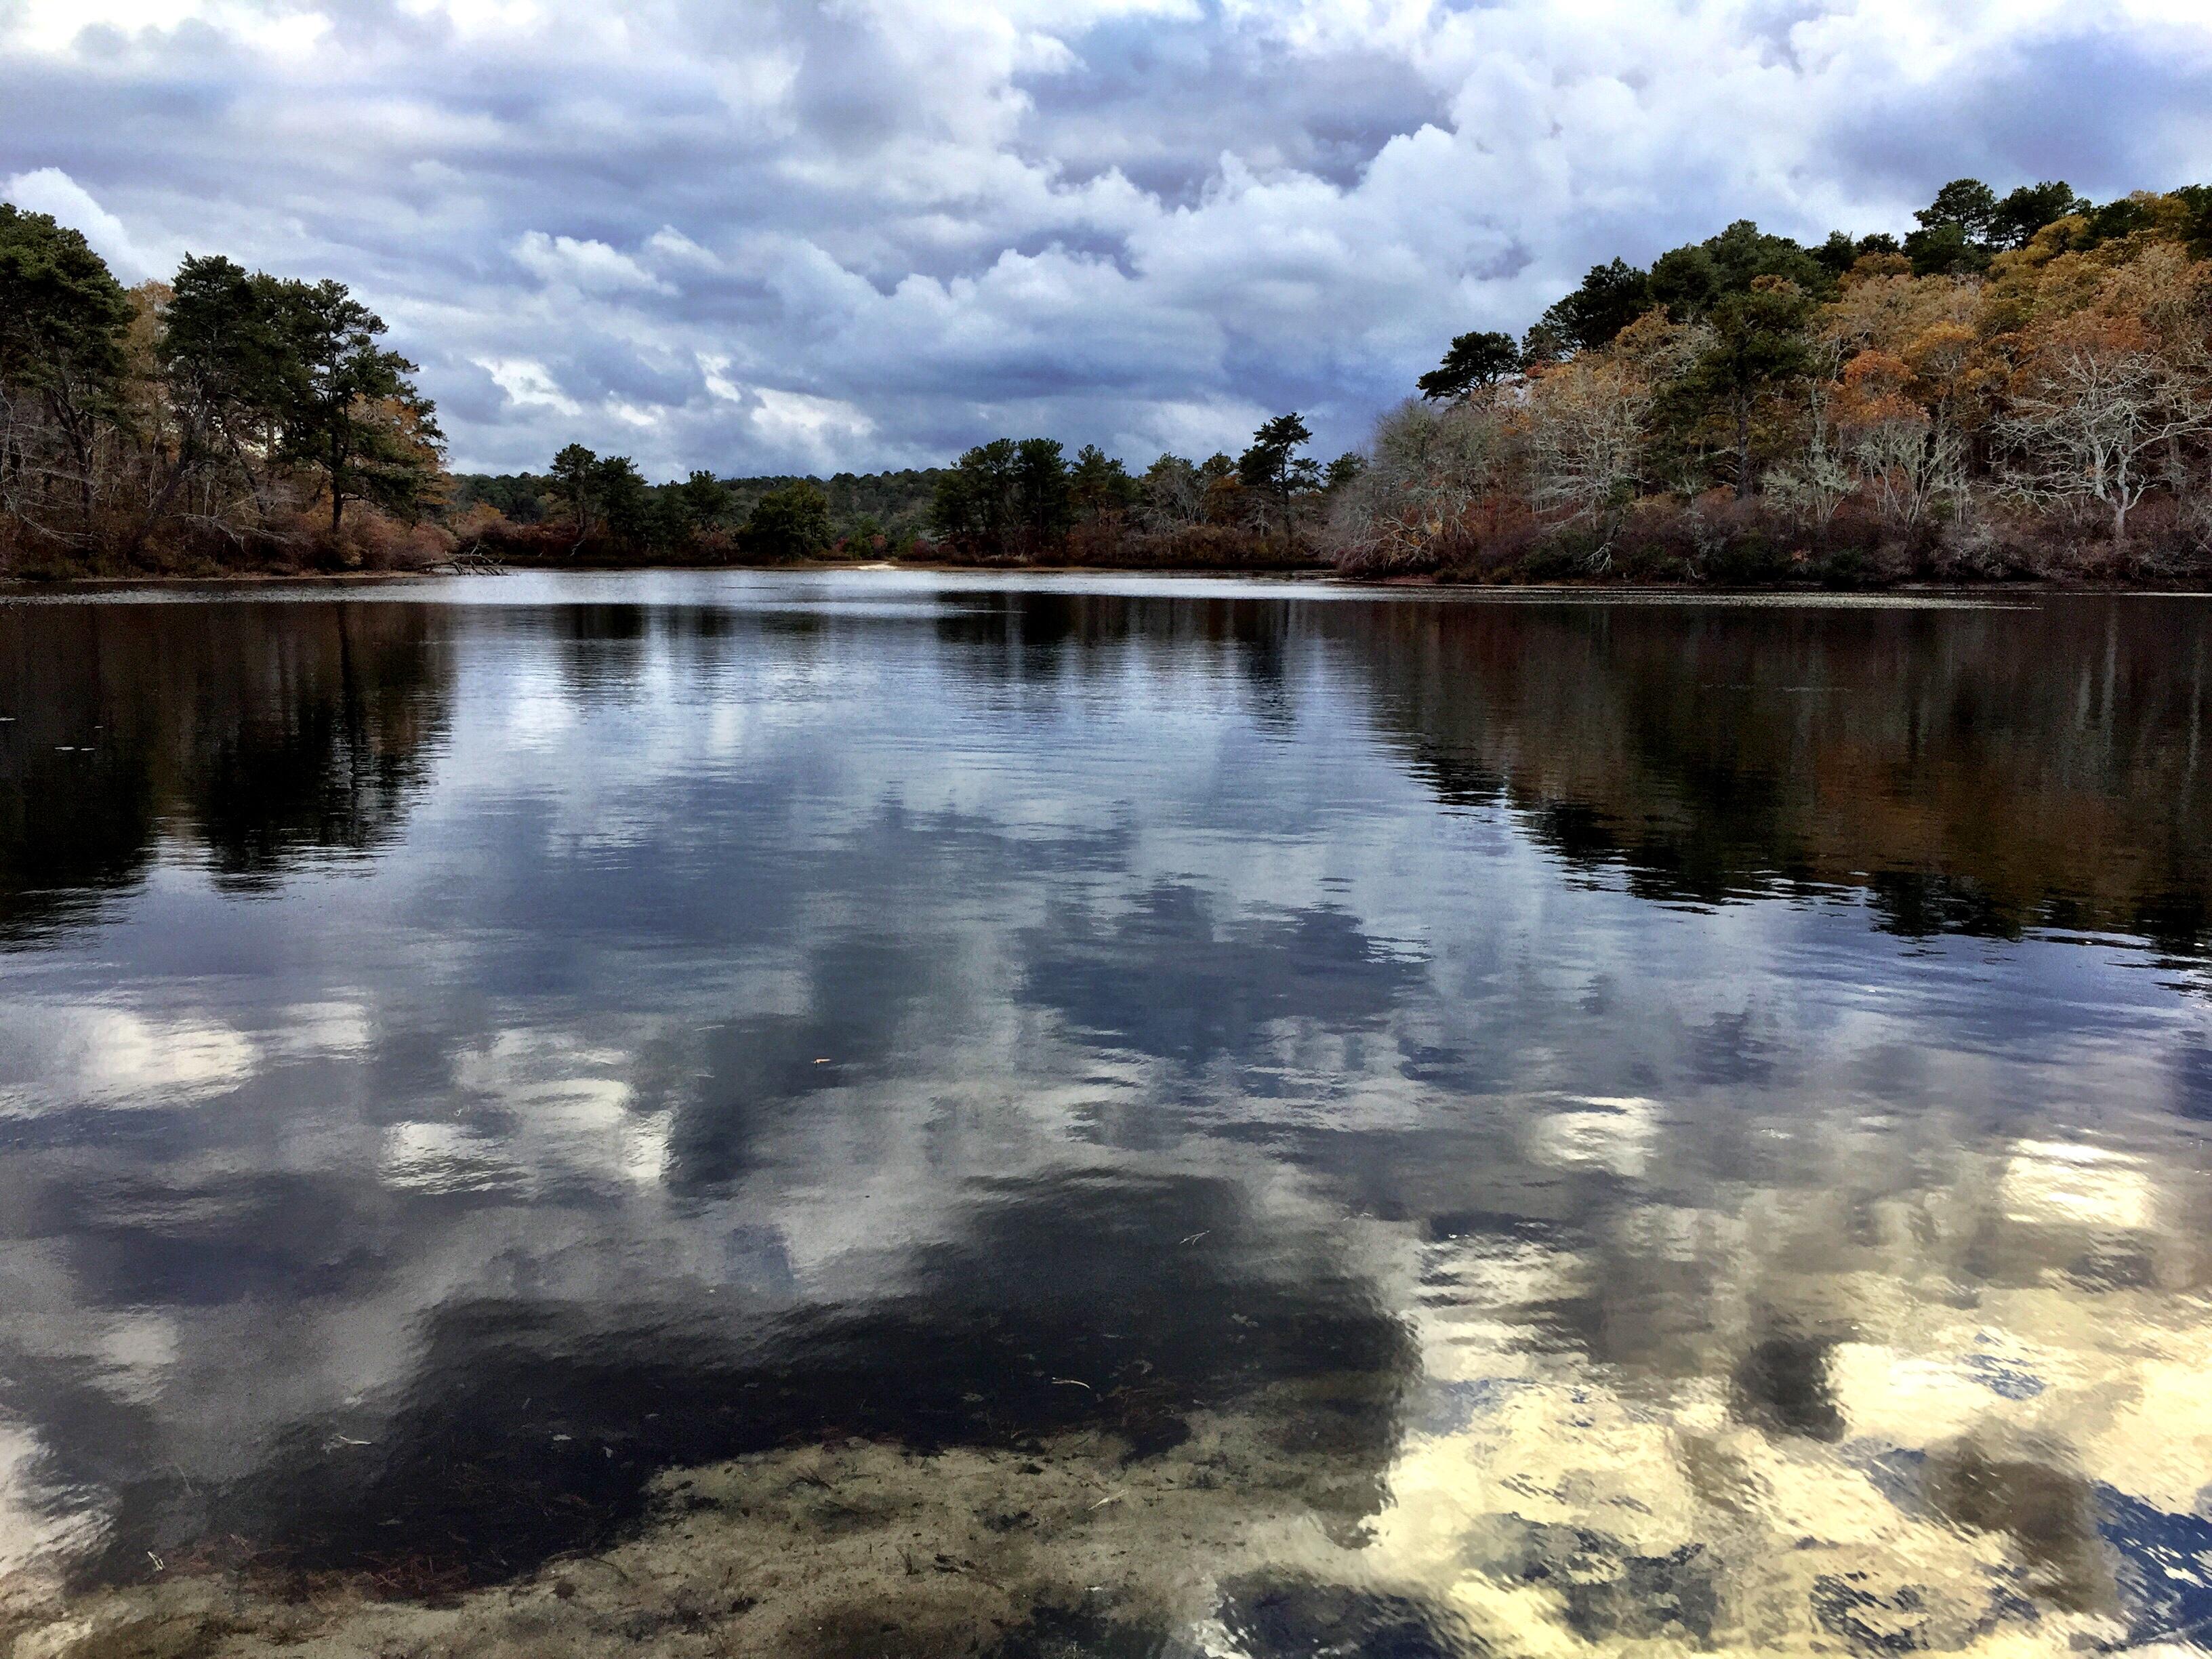 Northeast Pond, Wellfleet, MA